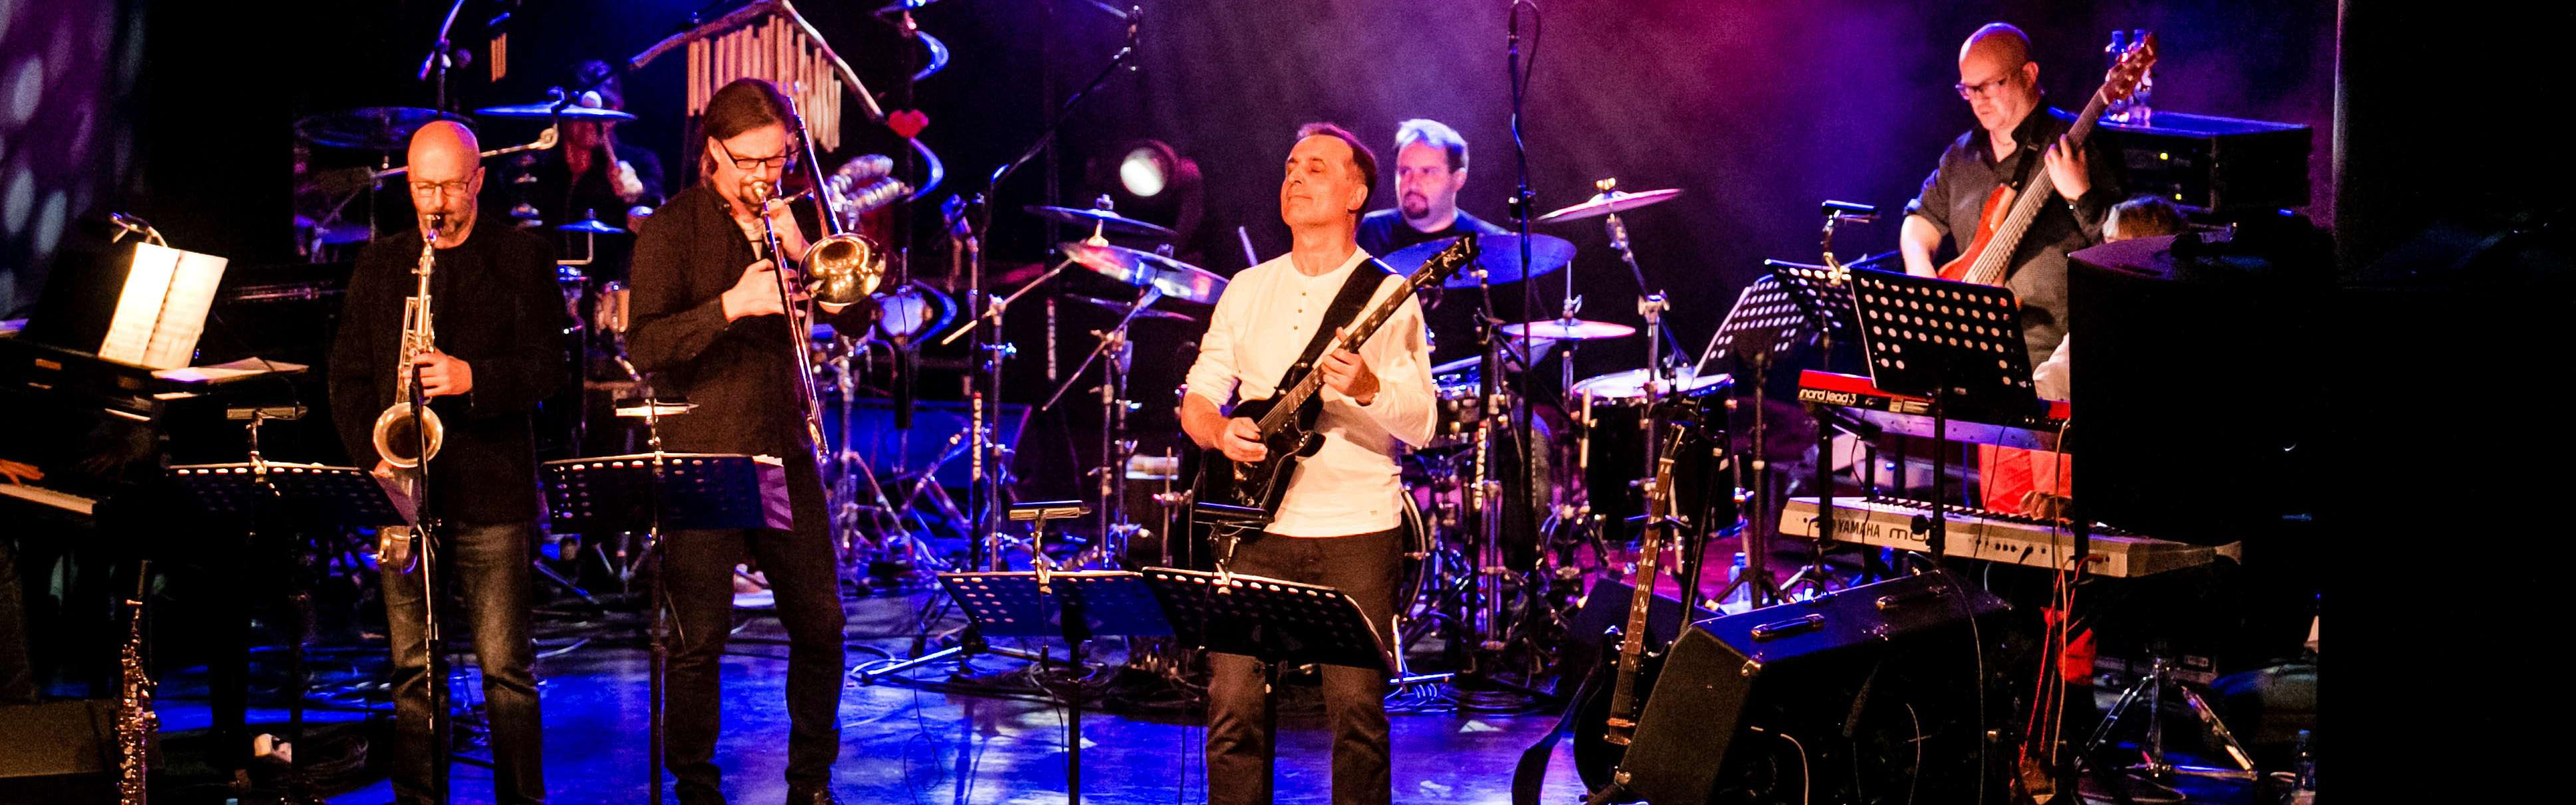 Krokus Jazz Festival